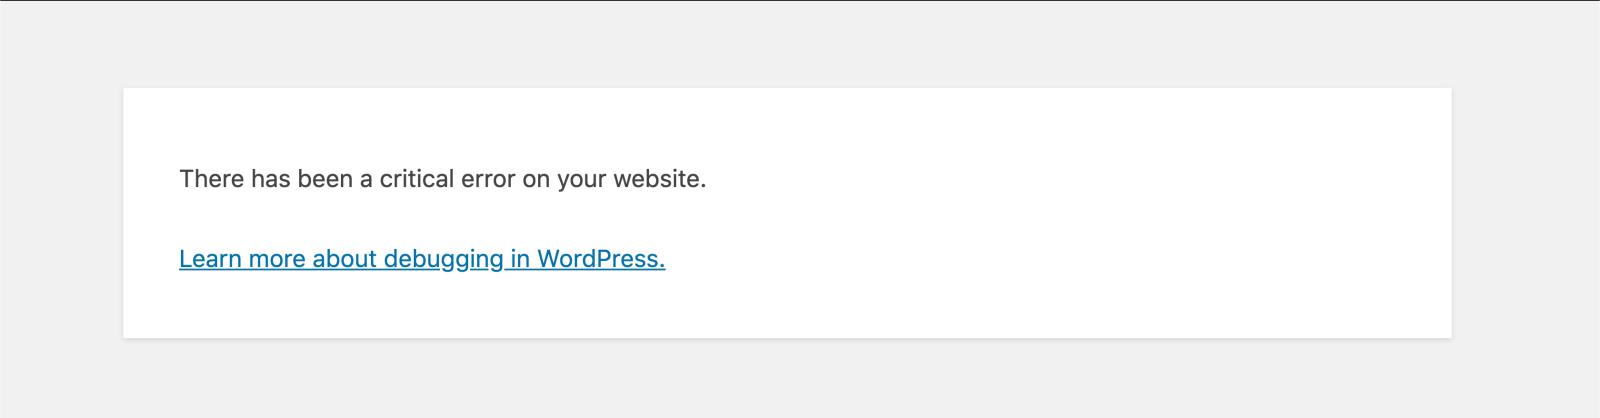 screenshot of wordpress error